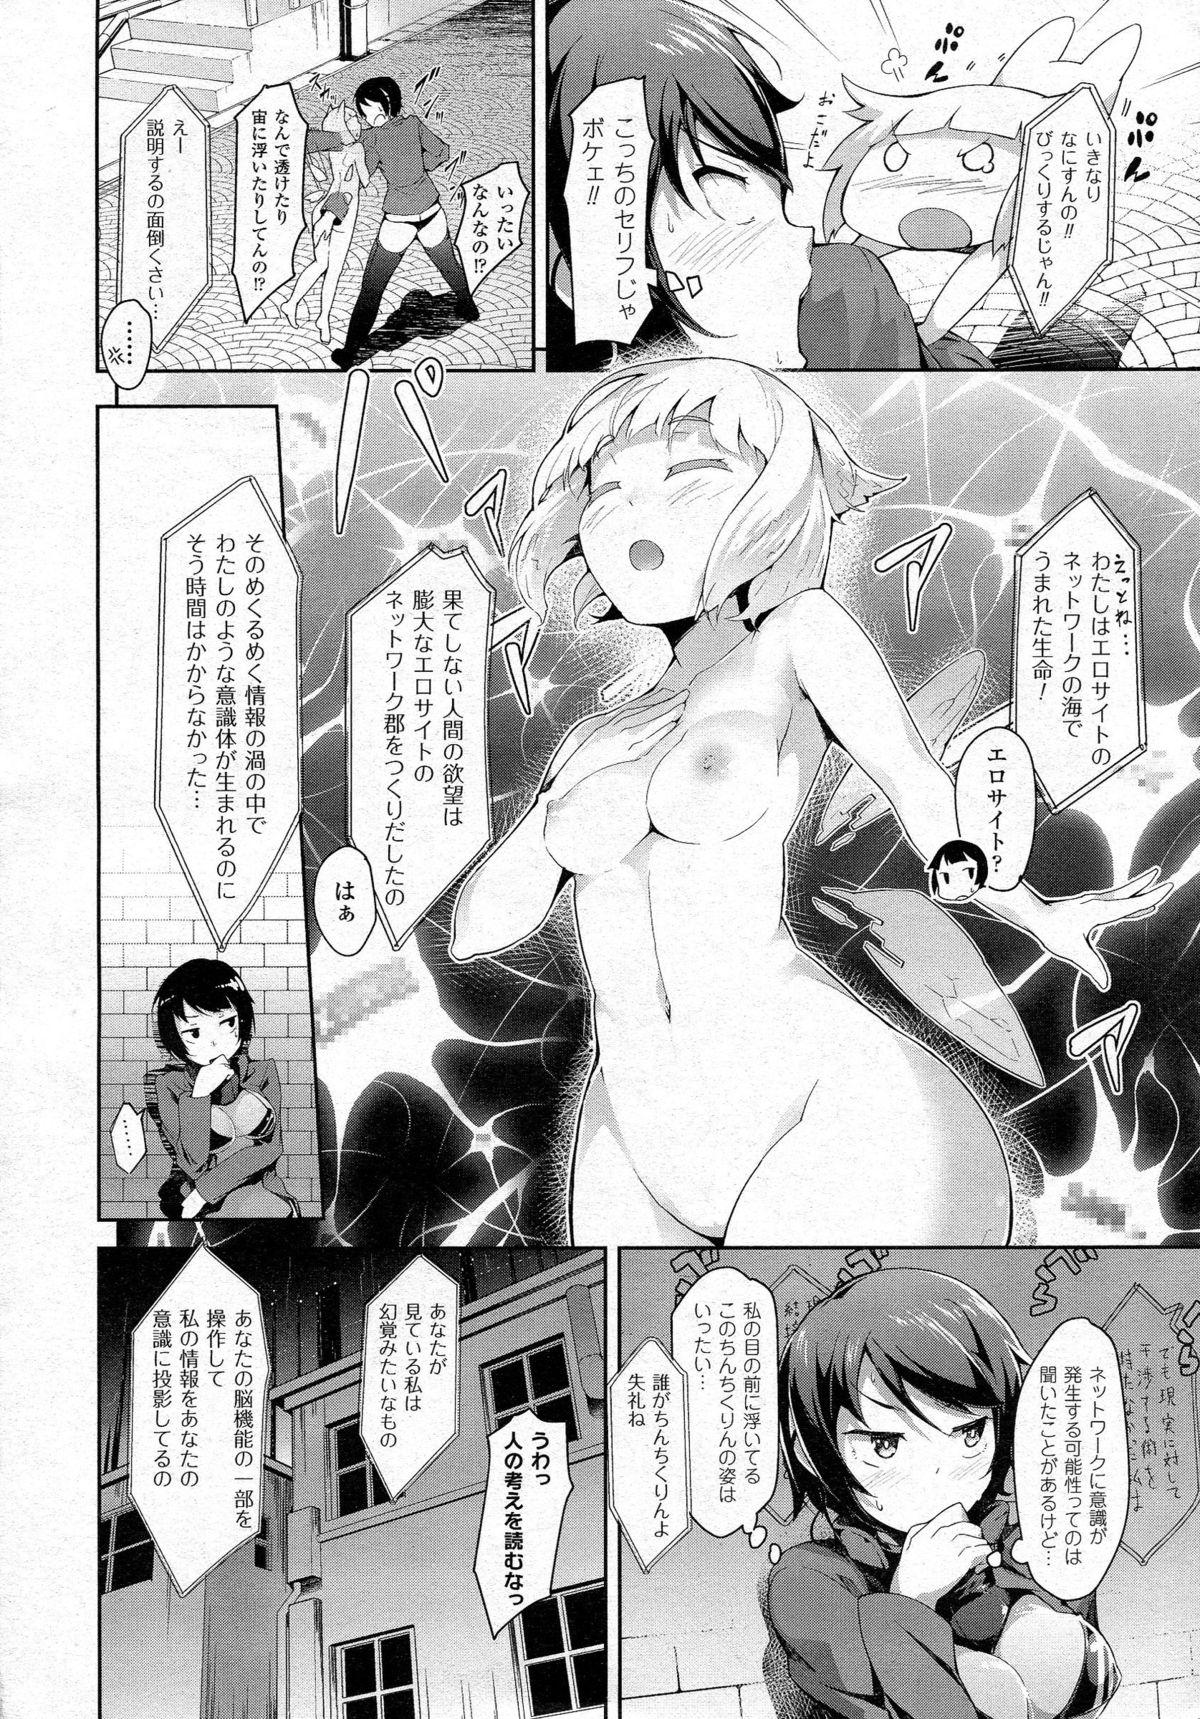 COMIC Unreal 2015-06 Vol. 55 + Hisasi Illust Shuu 397